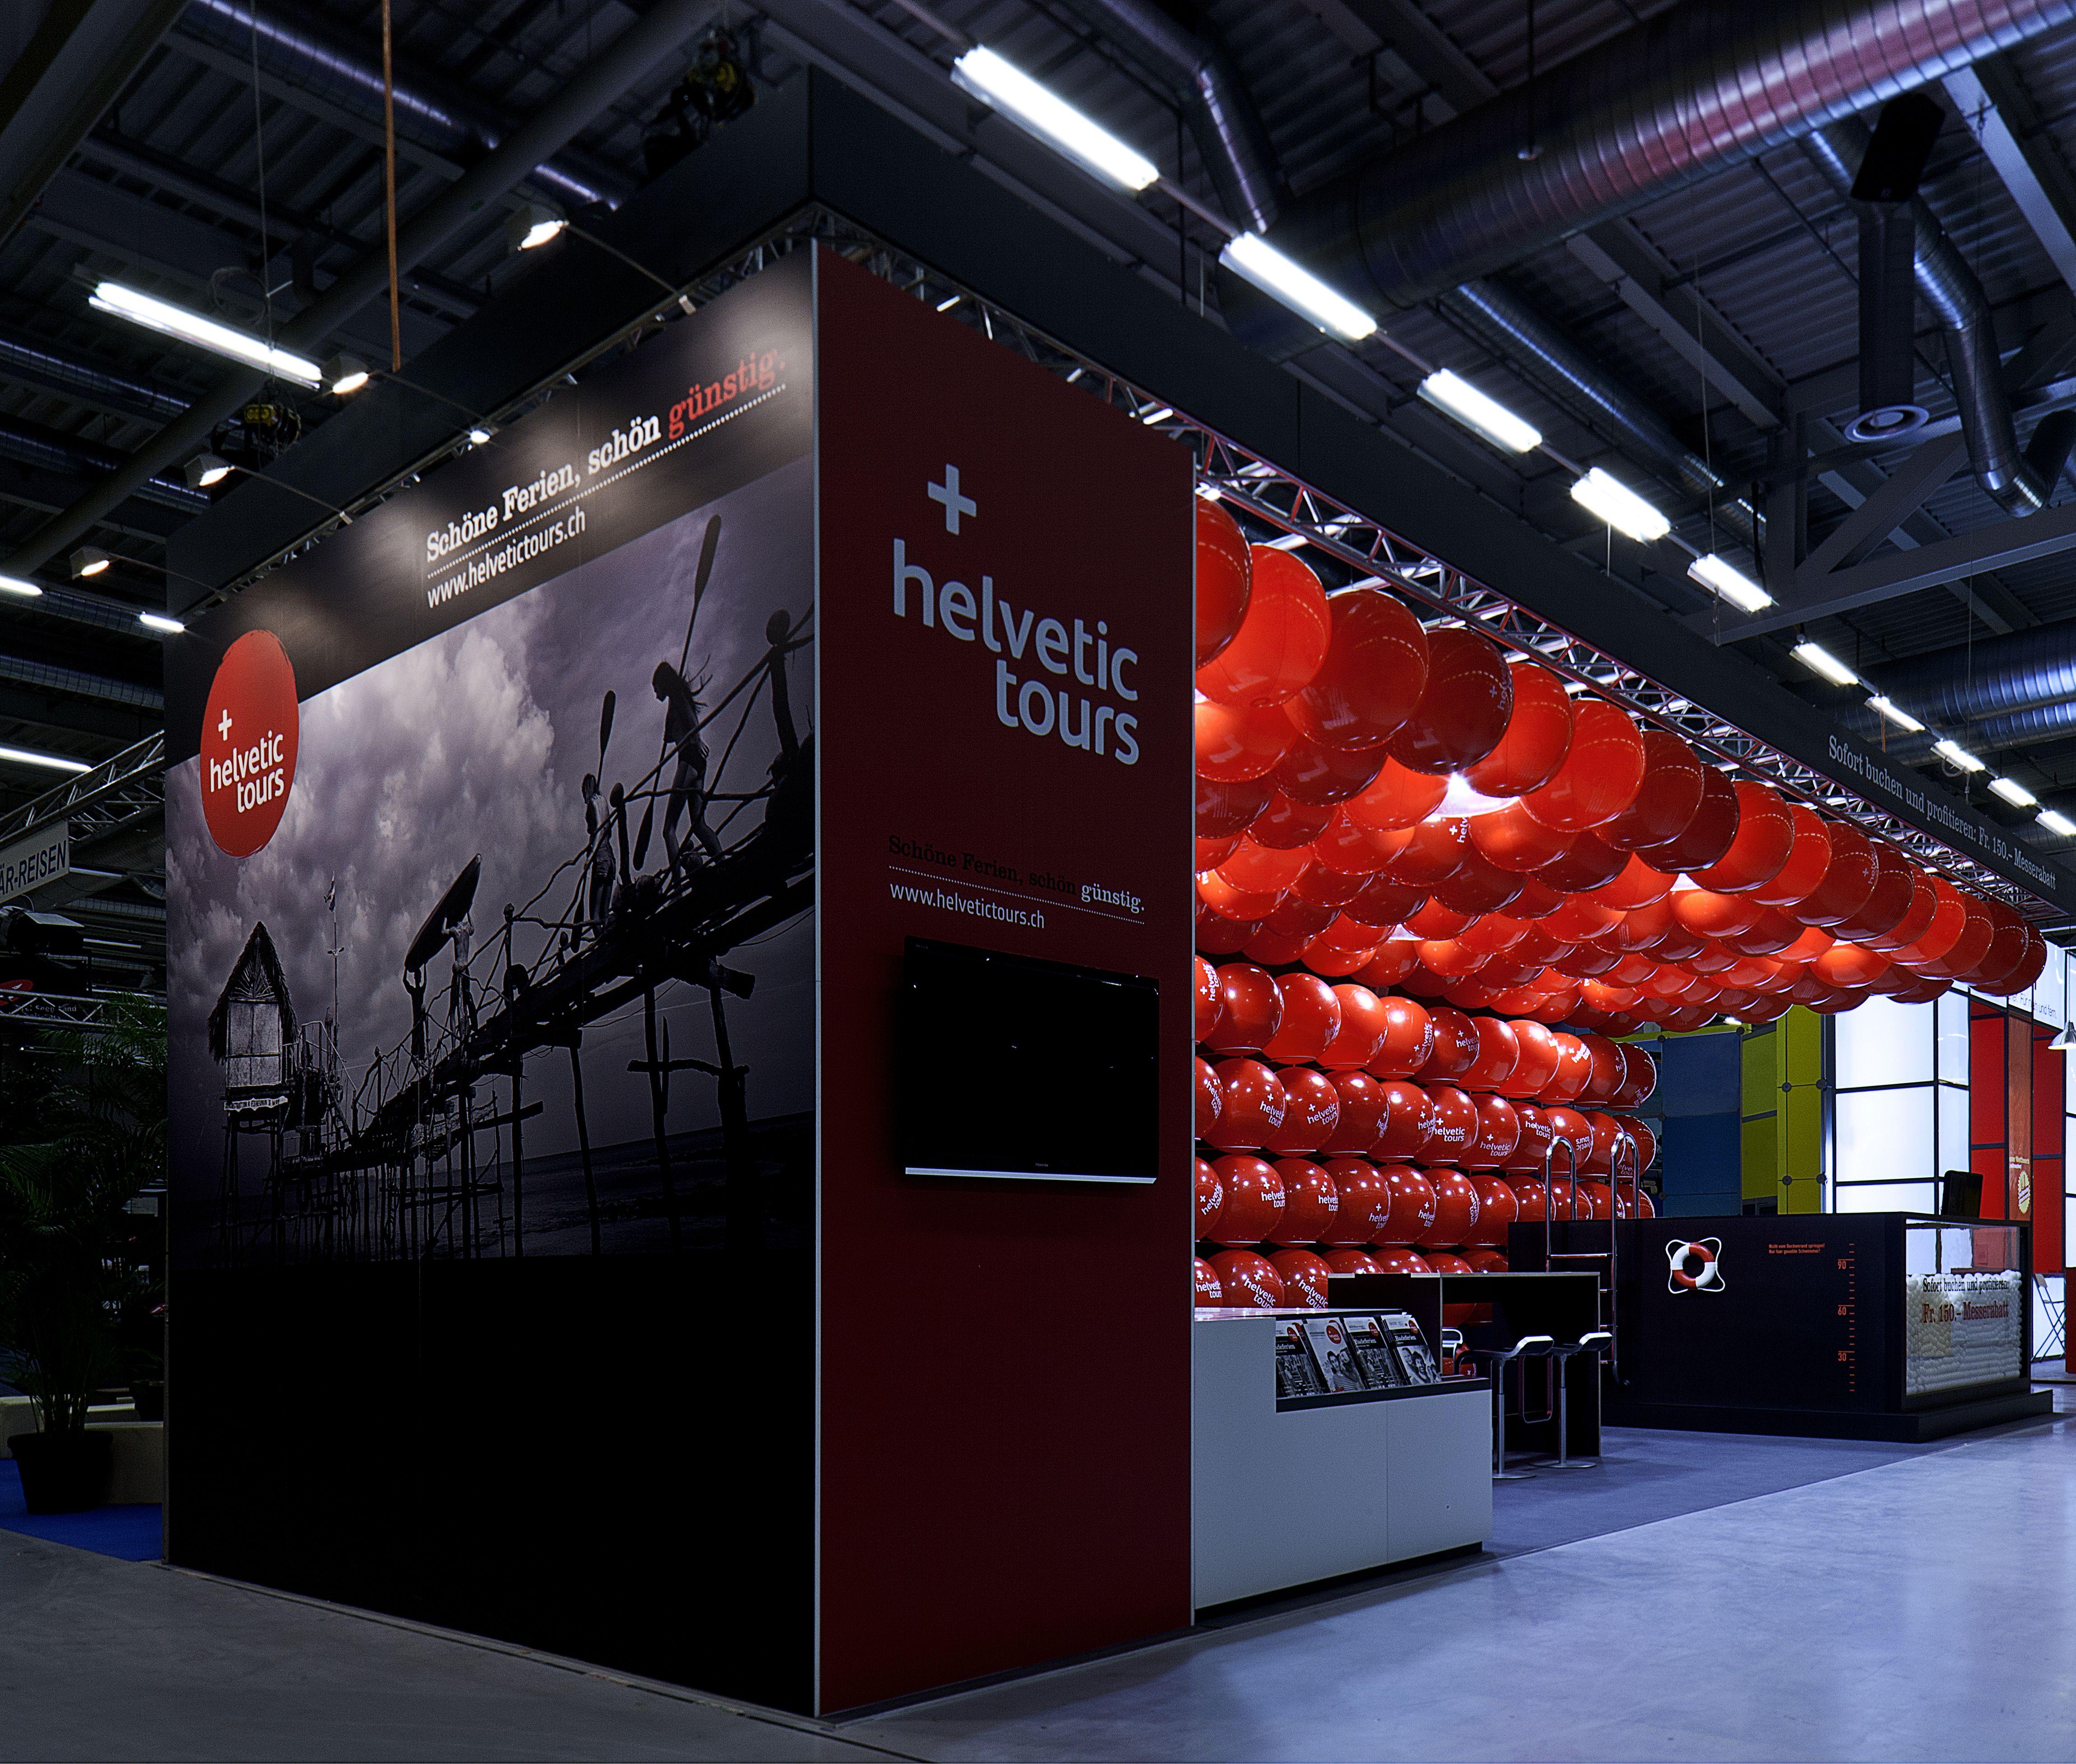 Trade Fair Stands Design : Helvetic tours trade fair stand design by dreimeta booth